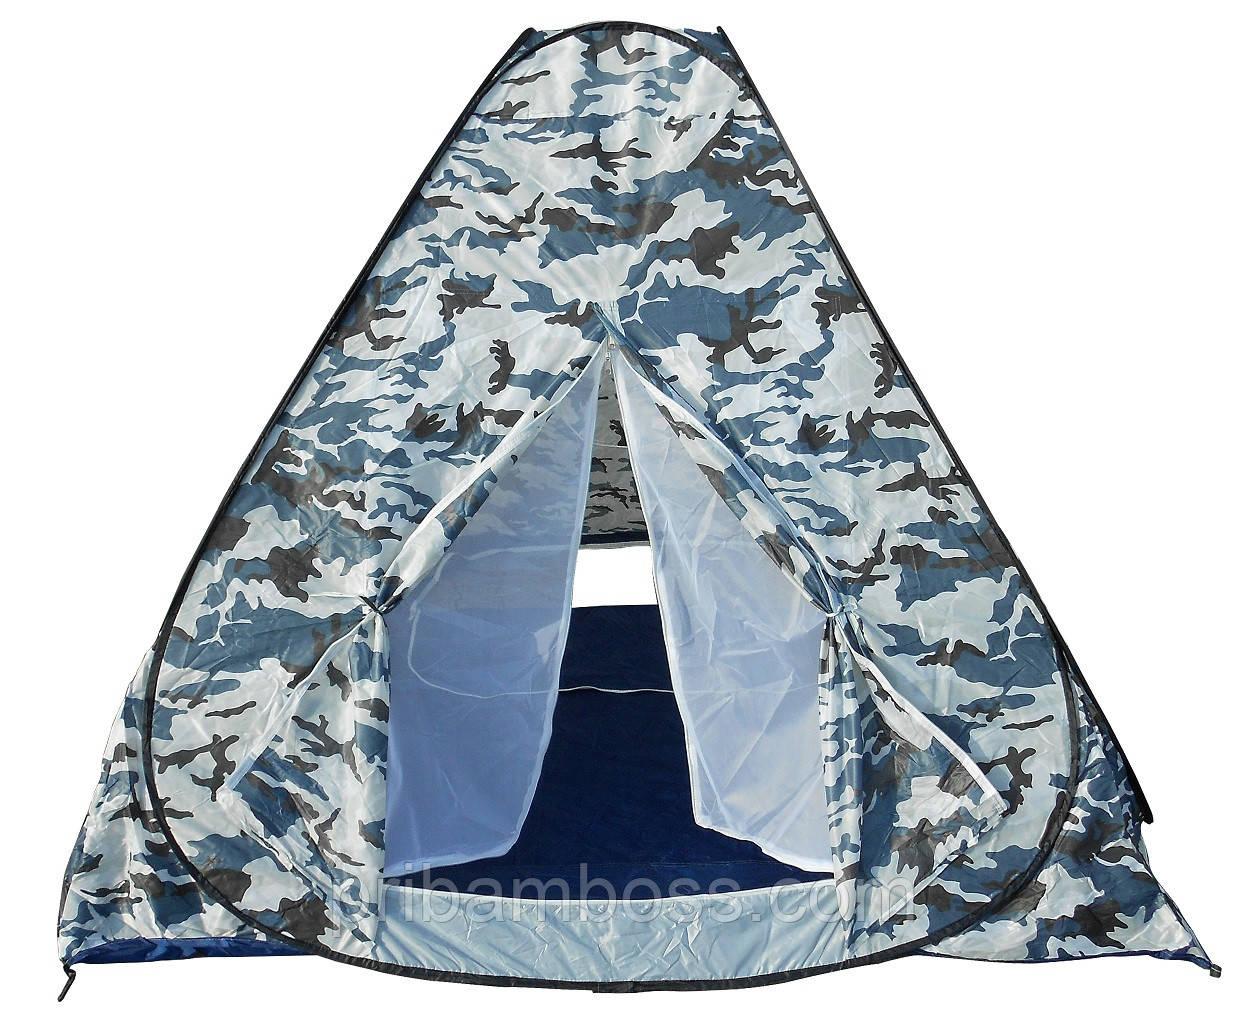 Всесезонная палатка-автомат Ranger winter-5 Hunter